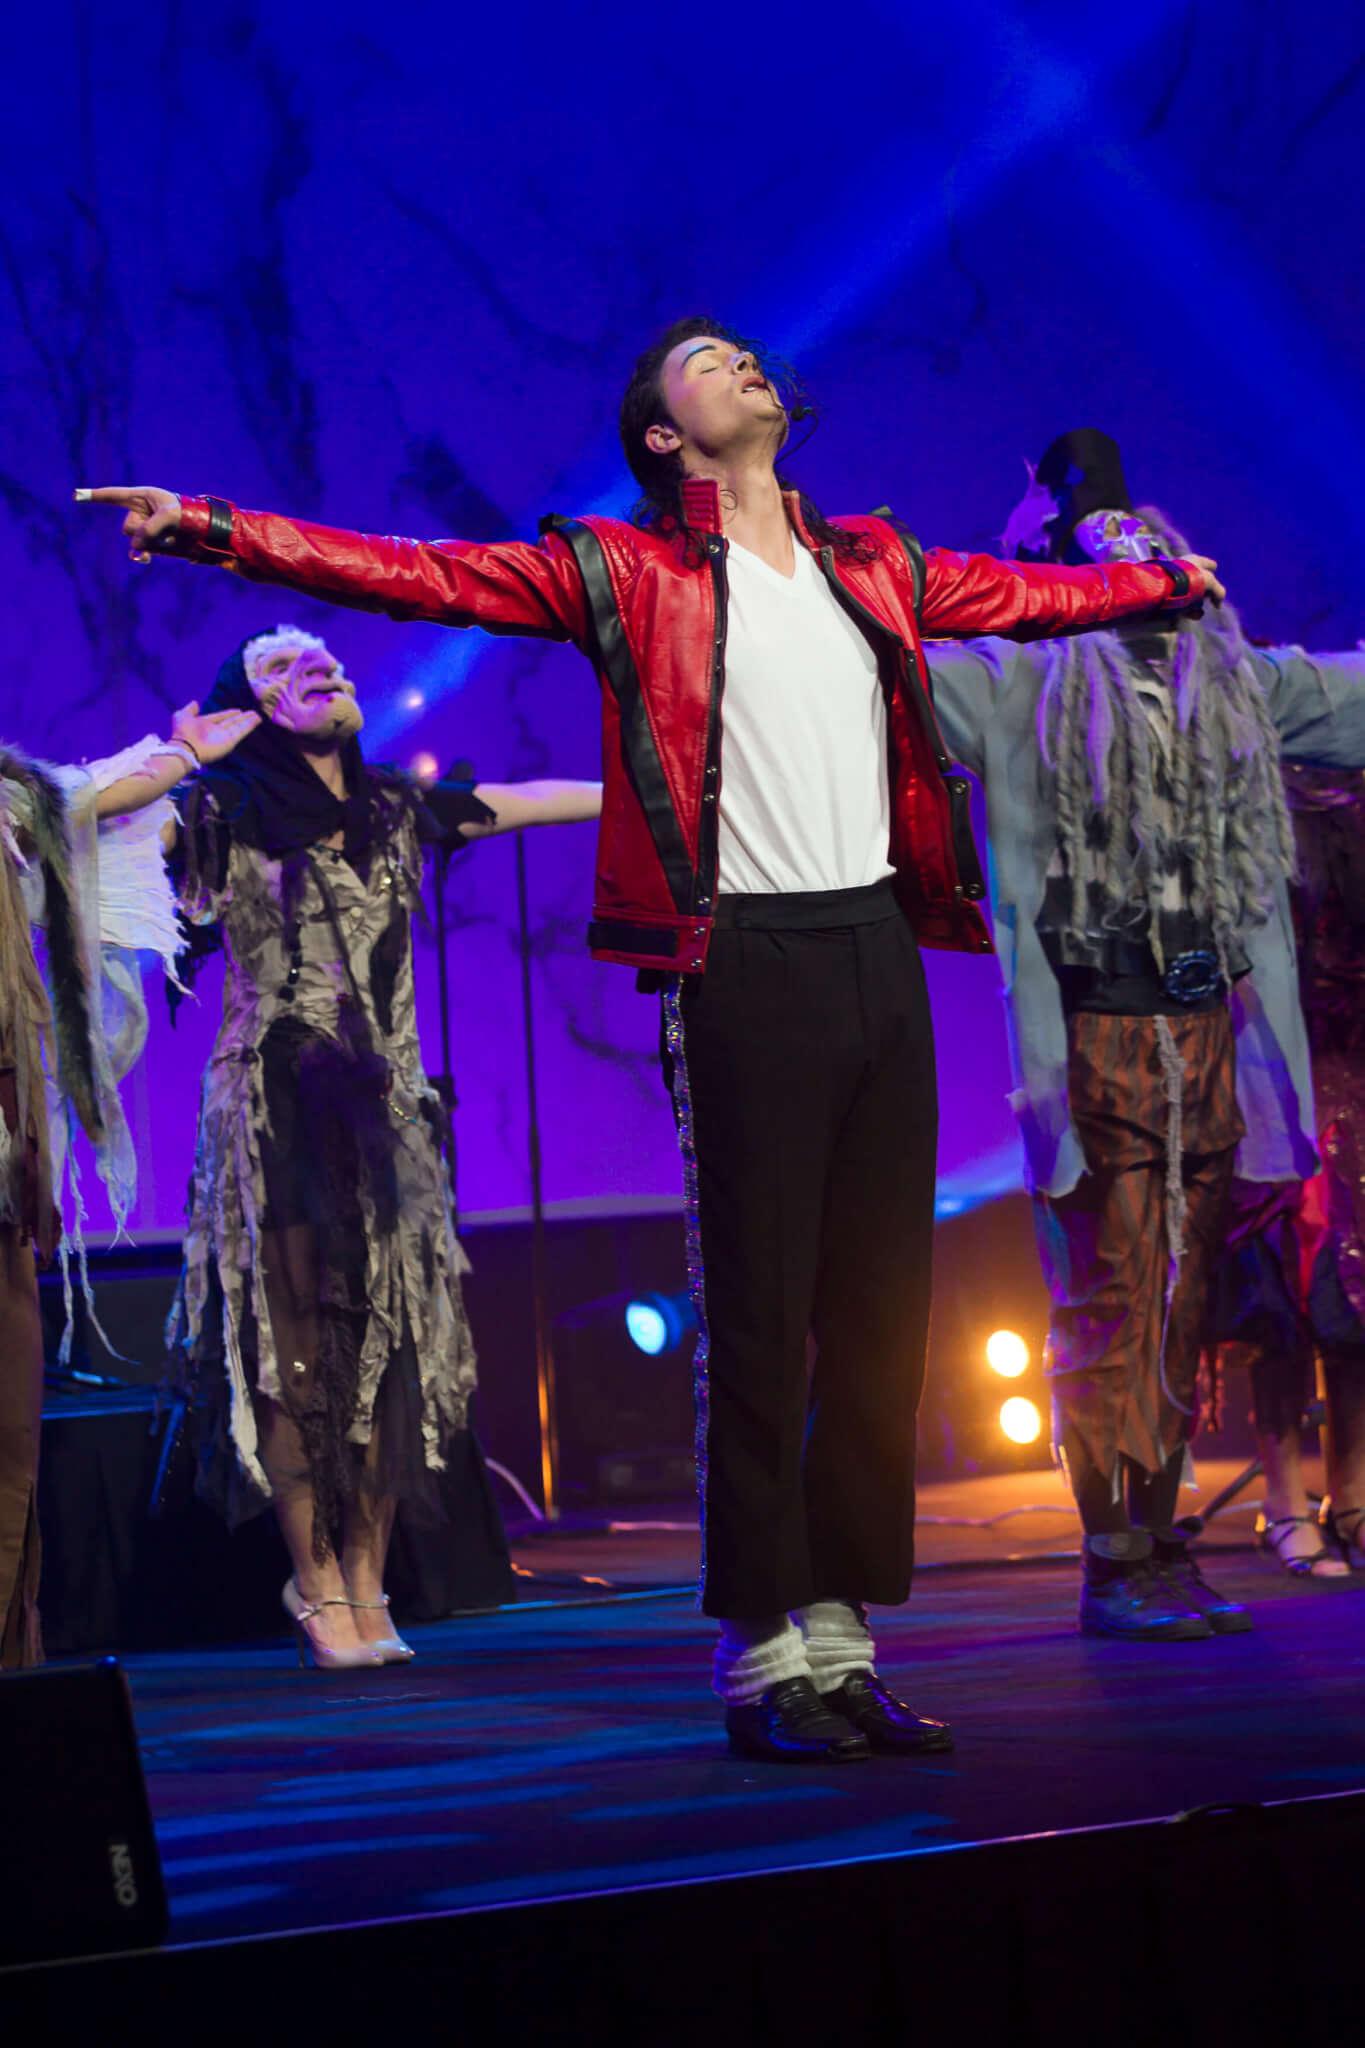 King of Pop - Tribute to Michael Jackson | TLC Healthcare Silver Jubilee